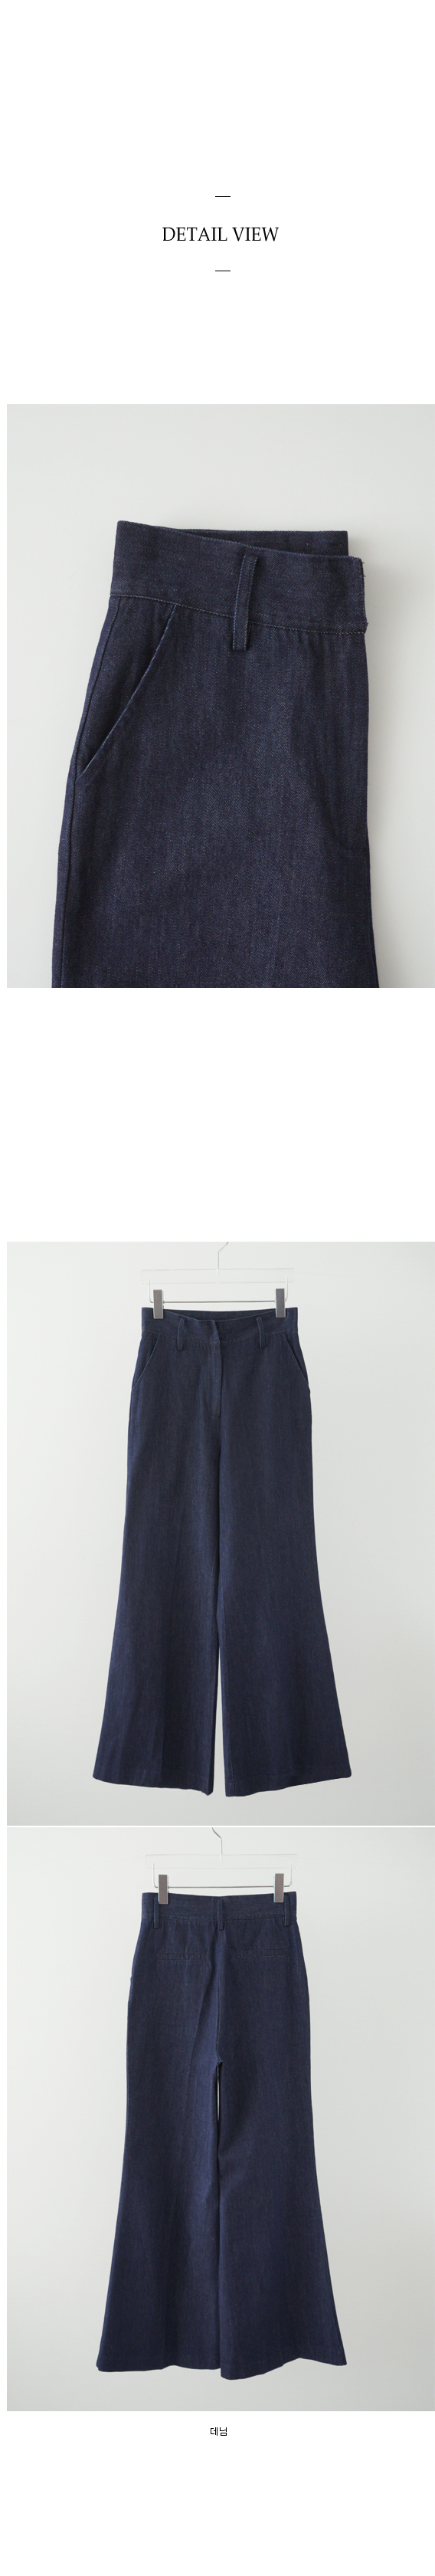 deep blue denim boots cut pants